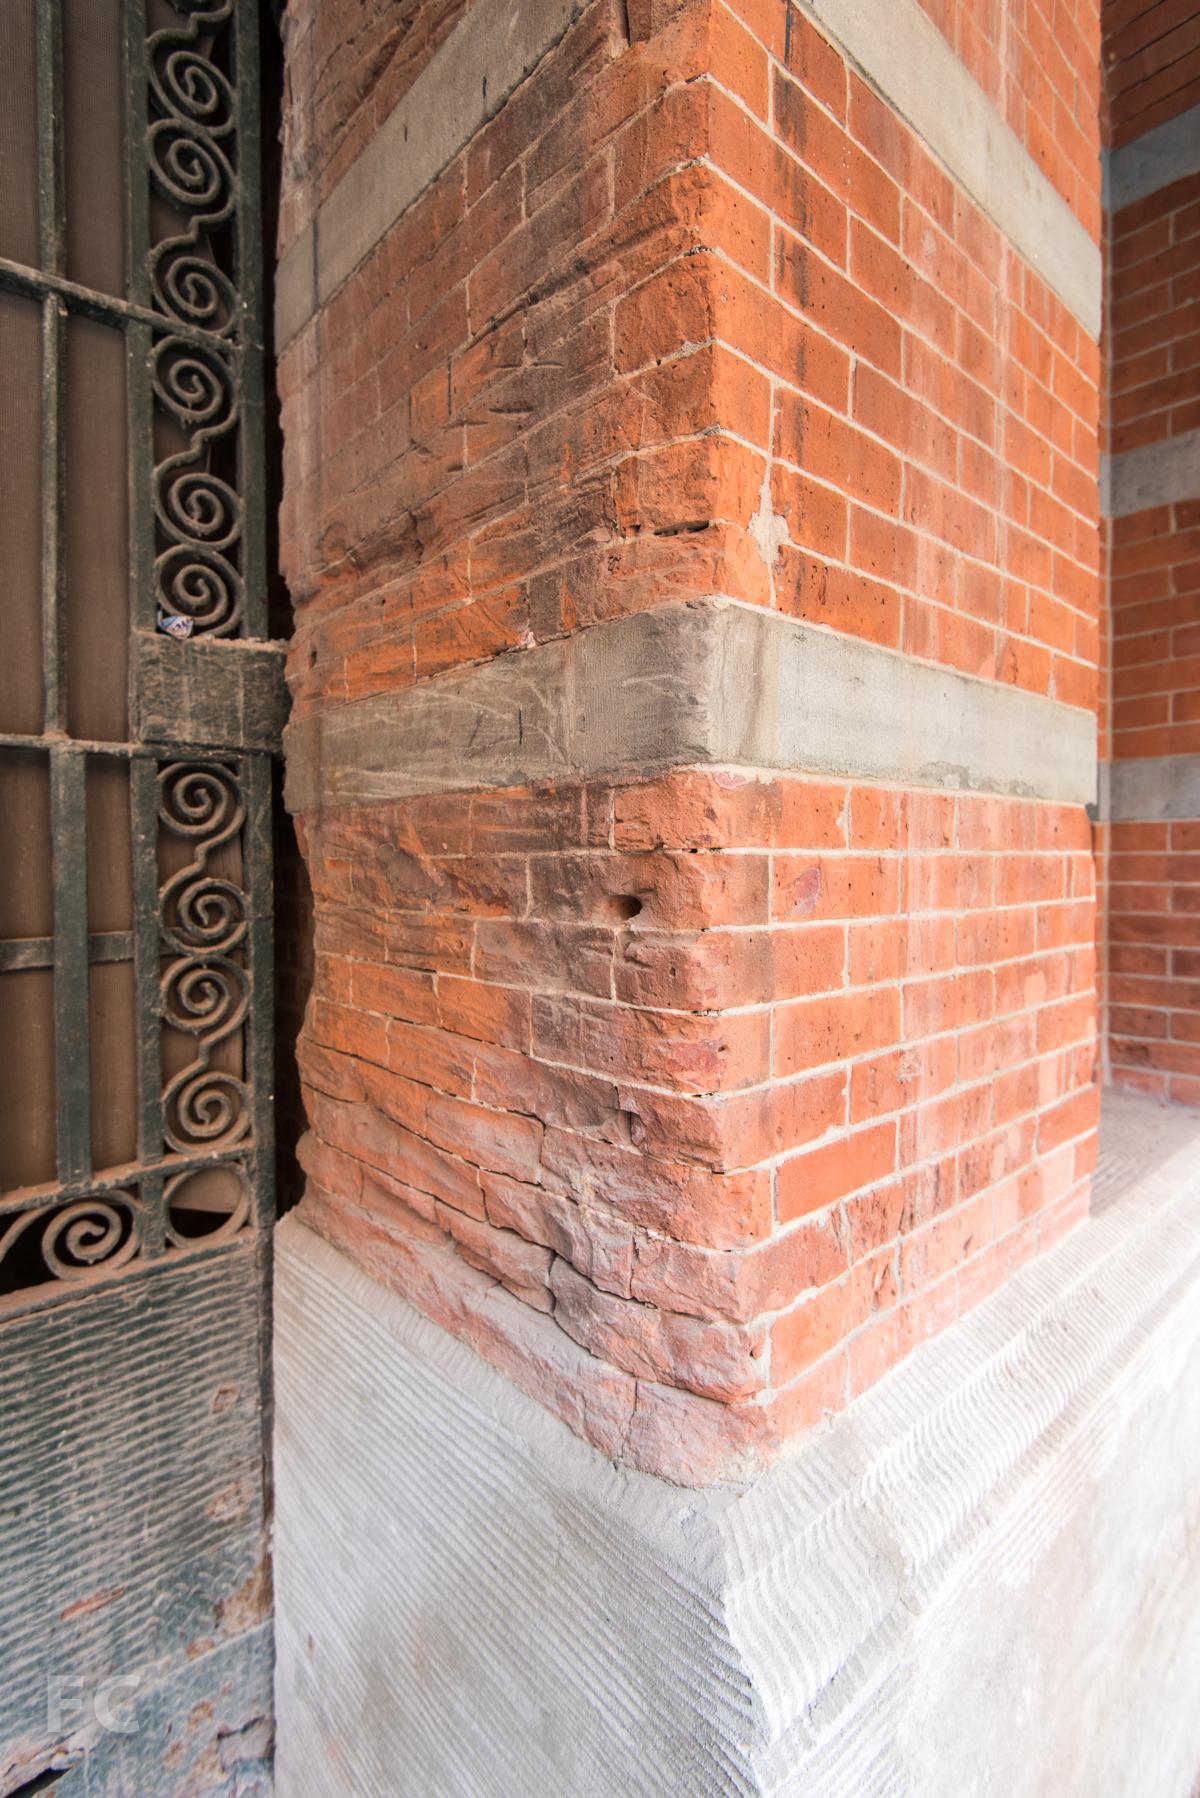 Detail of existing brickwork.